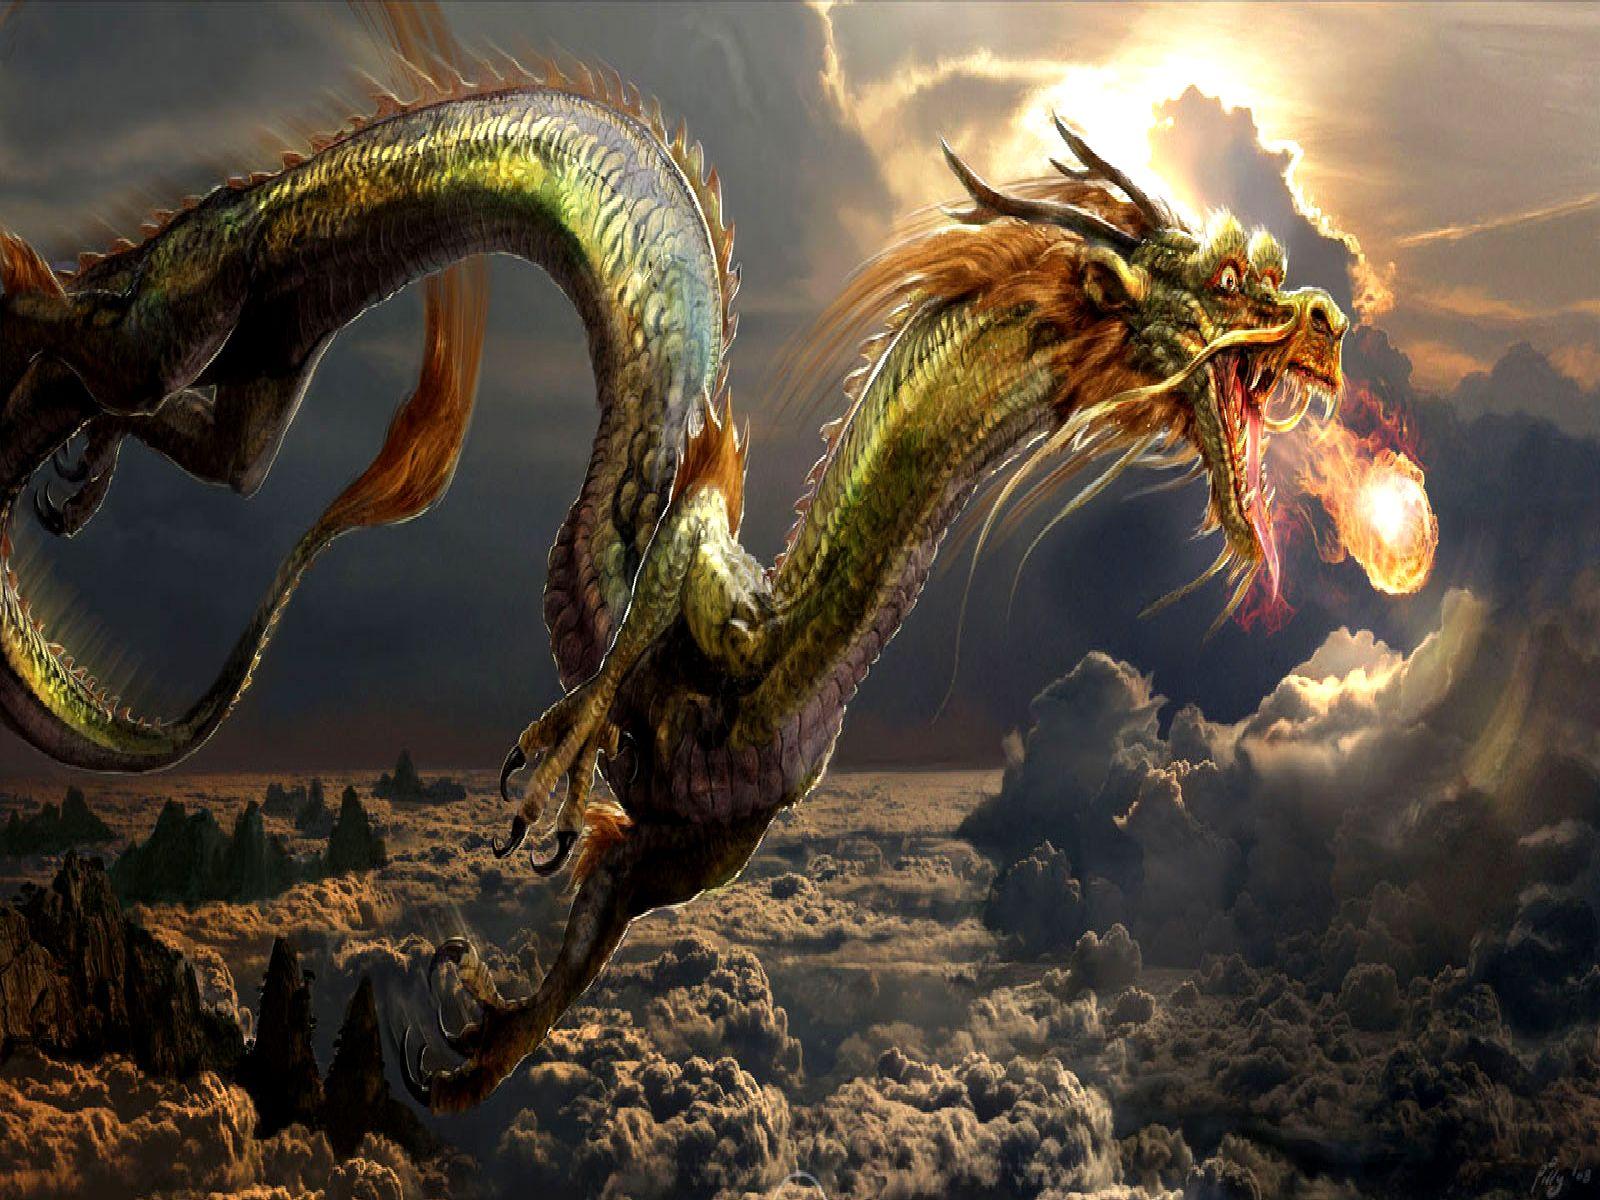 best images about celleska world of dragons world of dragons baby dragon red dragon and black dragon